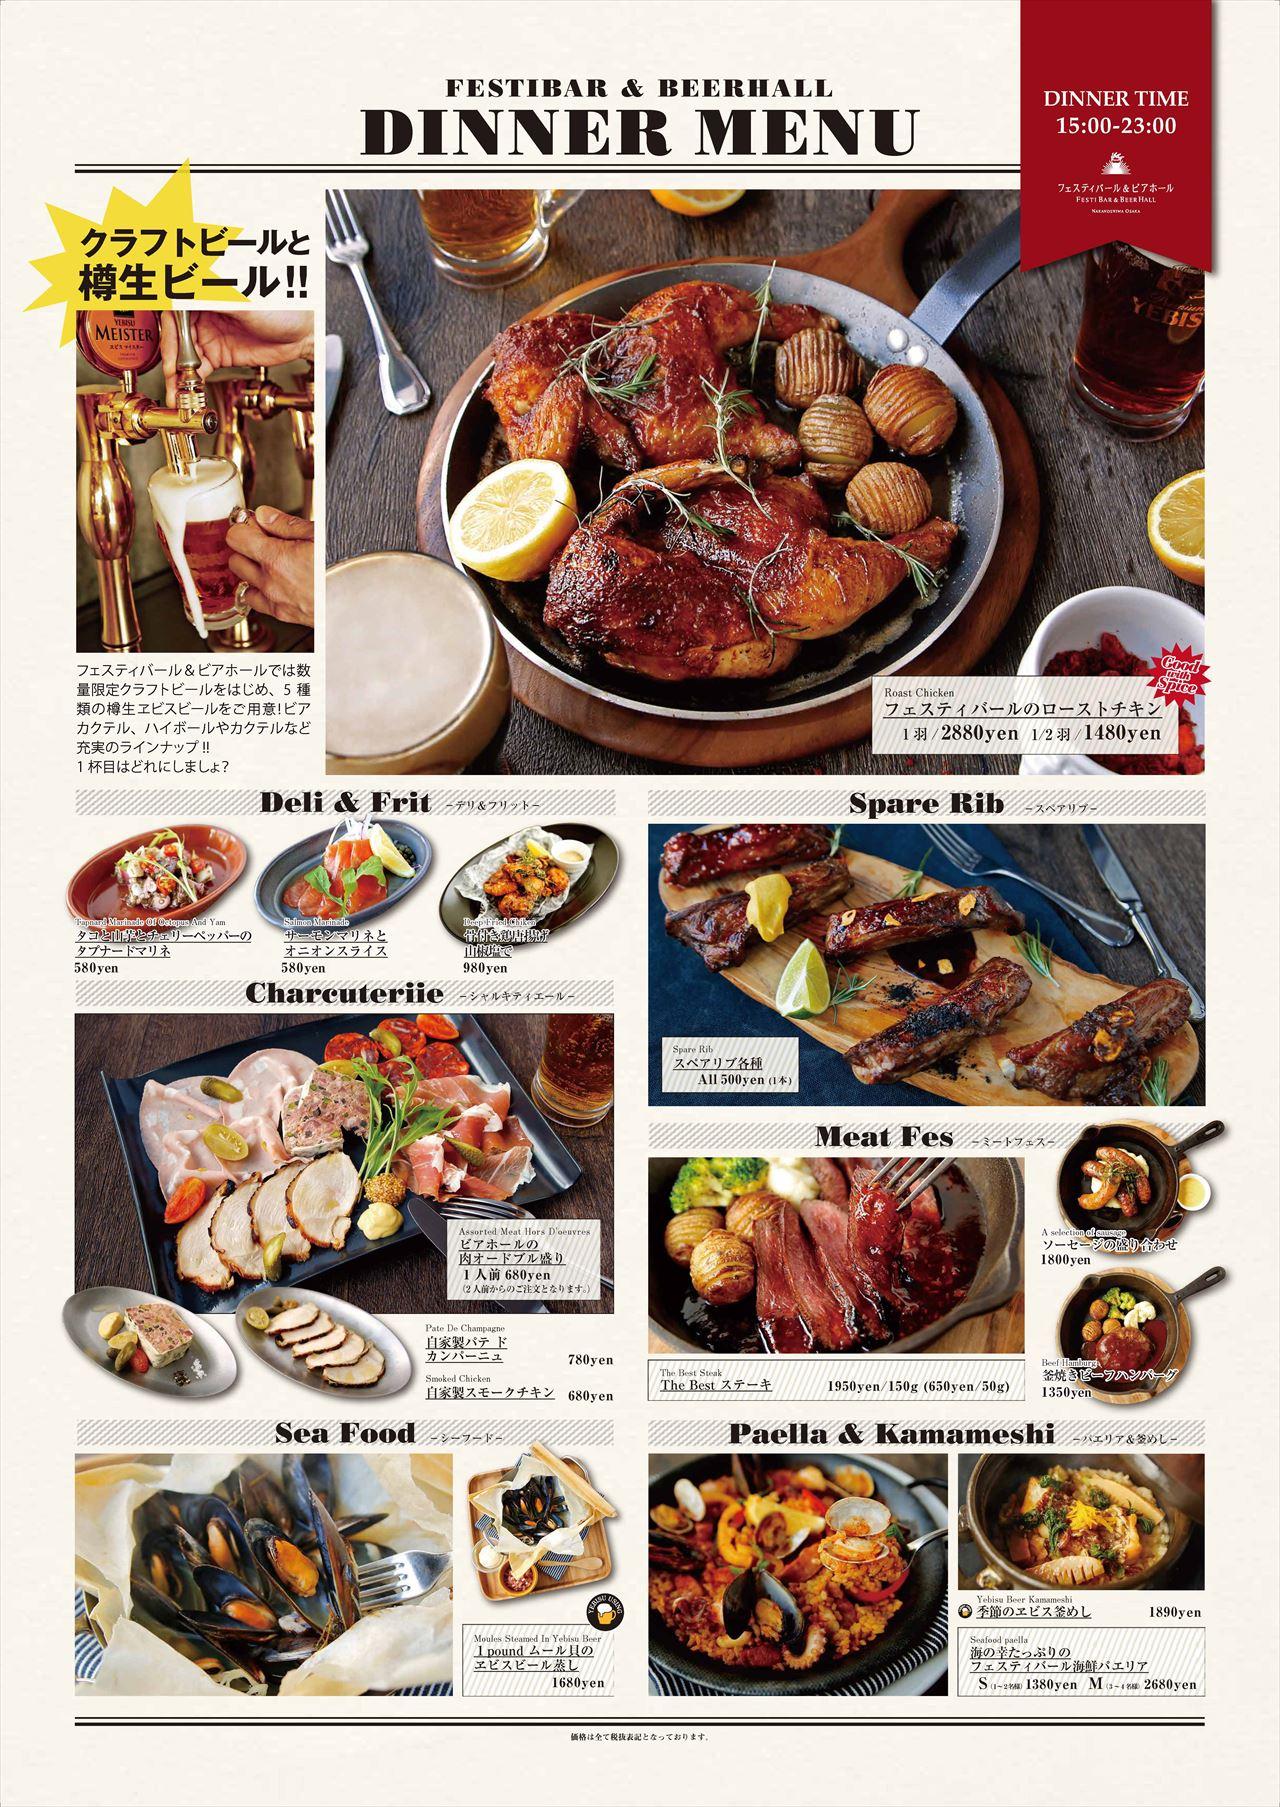 201704_B1_dinnermenu_pos_noguide